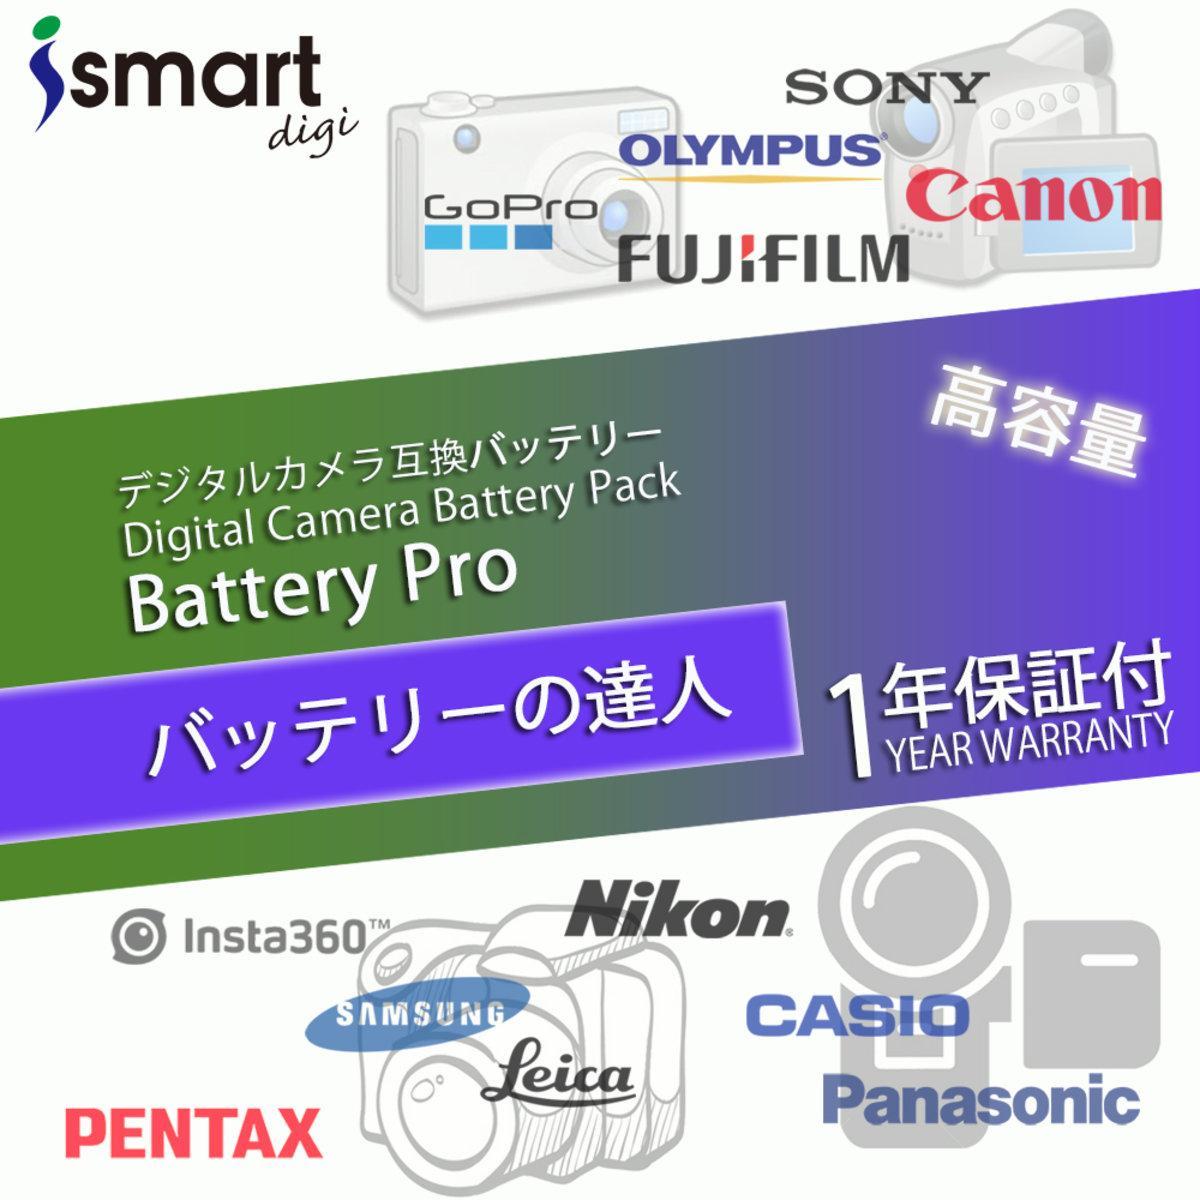 Konica Minolta Digital Camera Battery NP-1